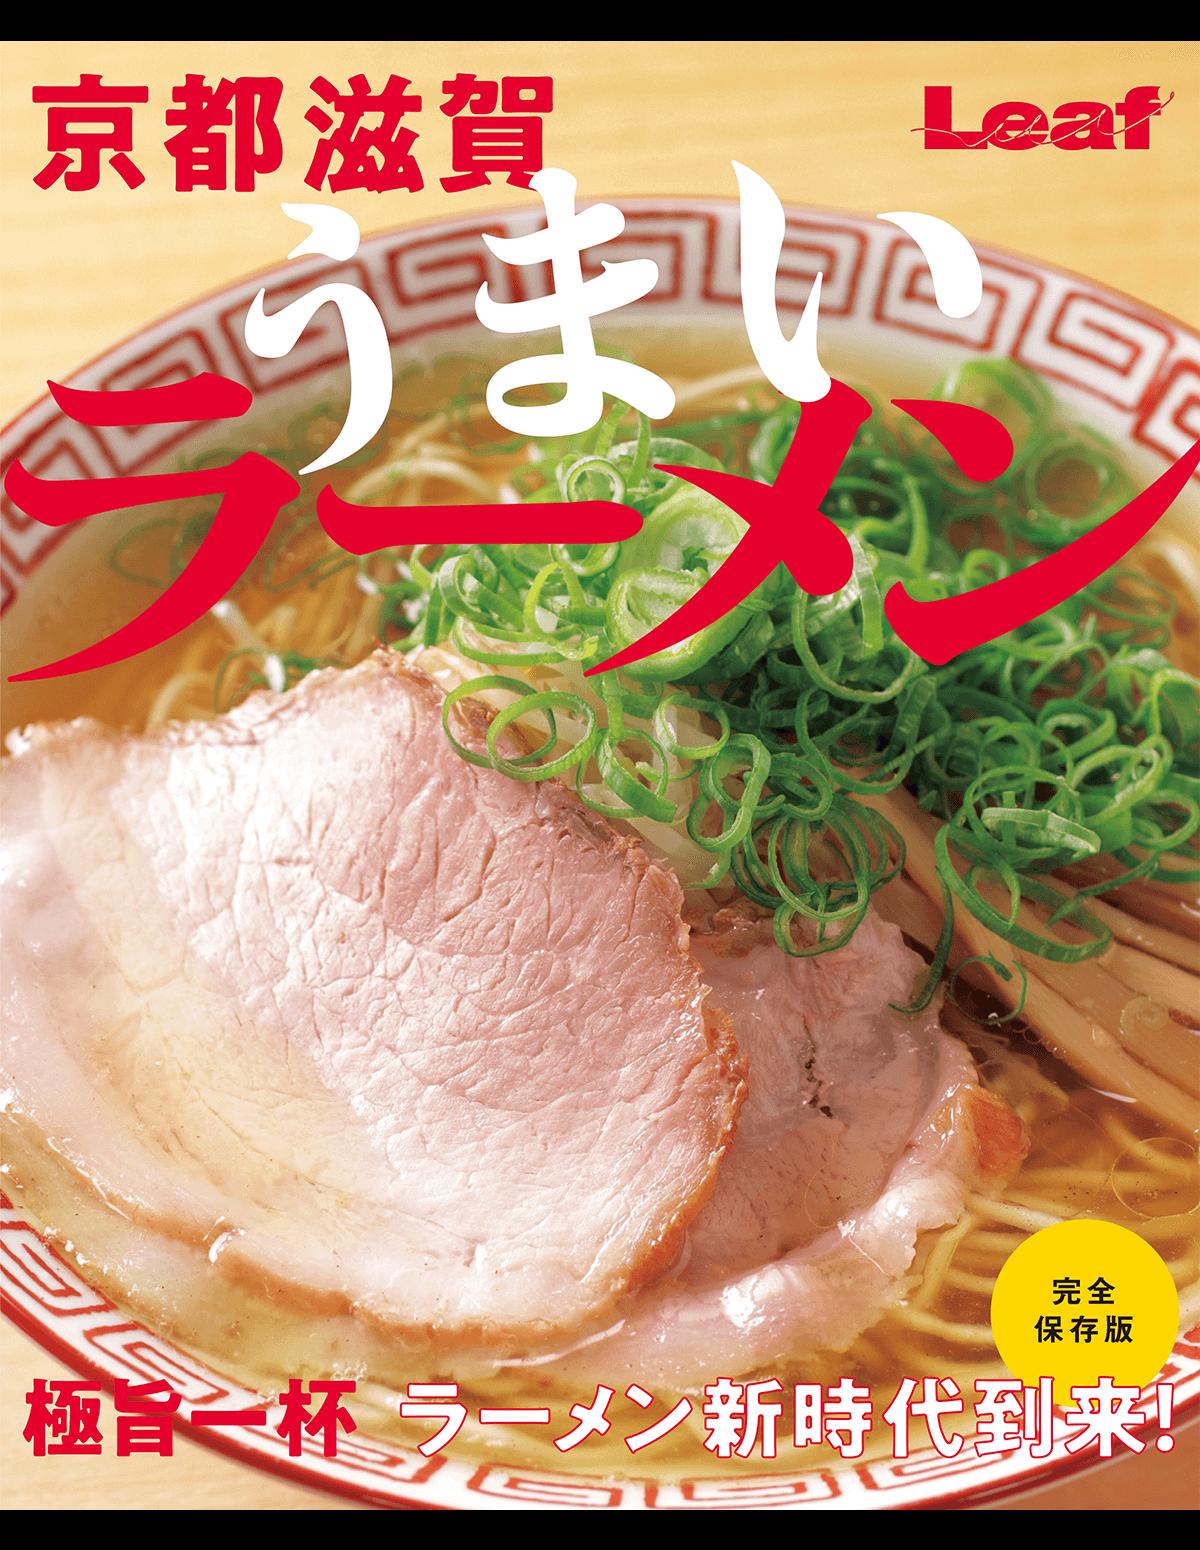 LeafMOOK「京都 滋賀 うまいラーメン」